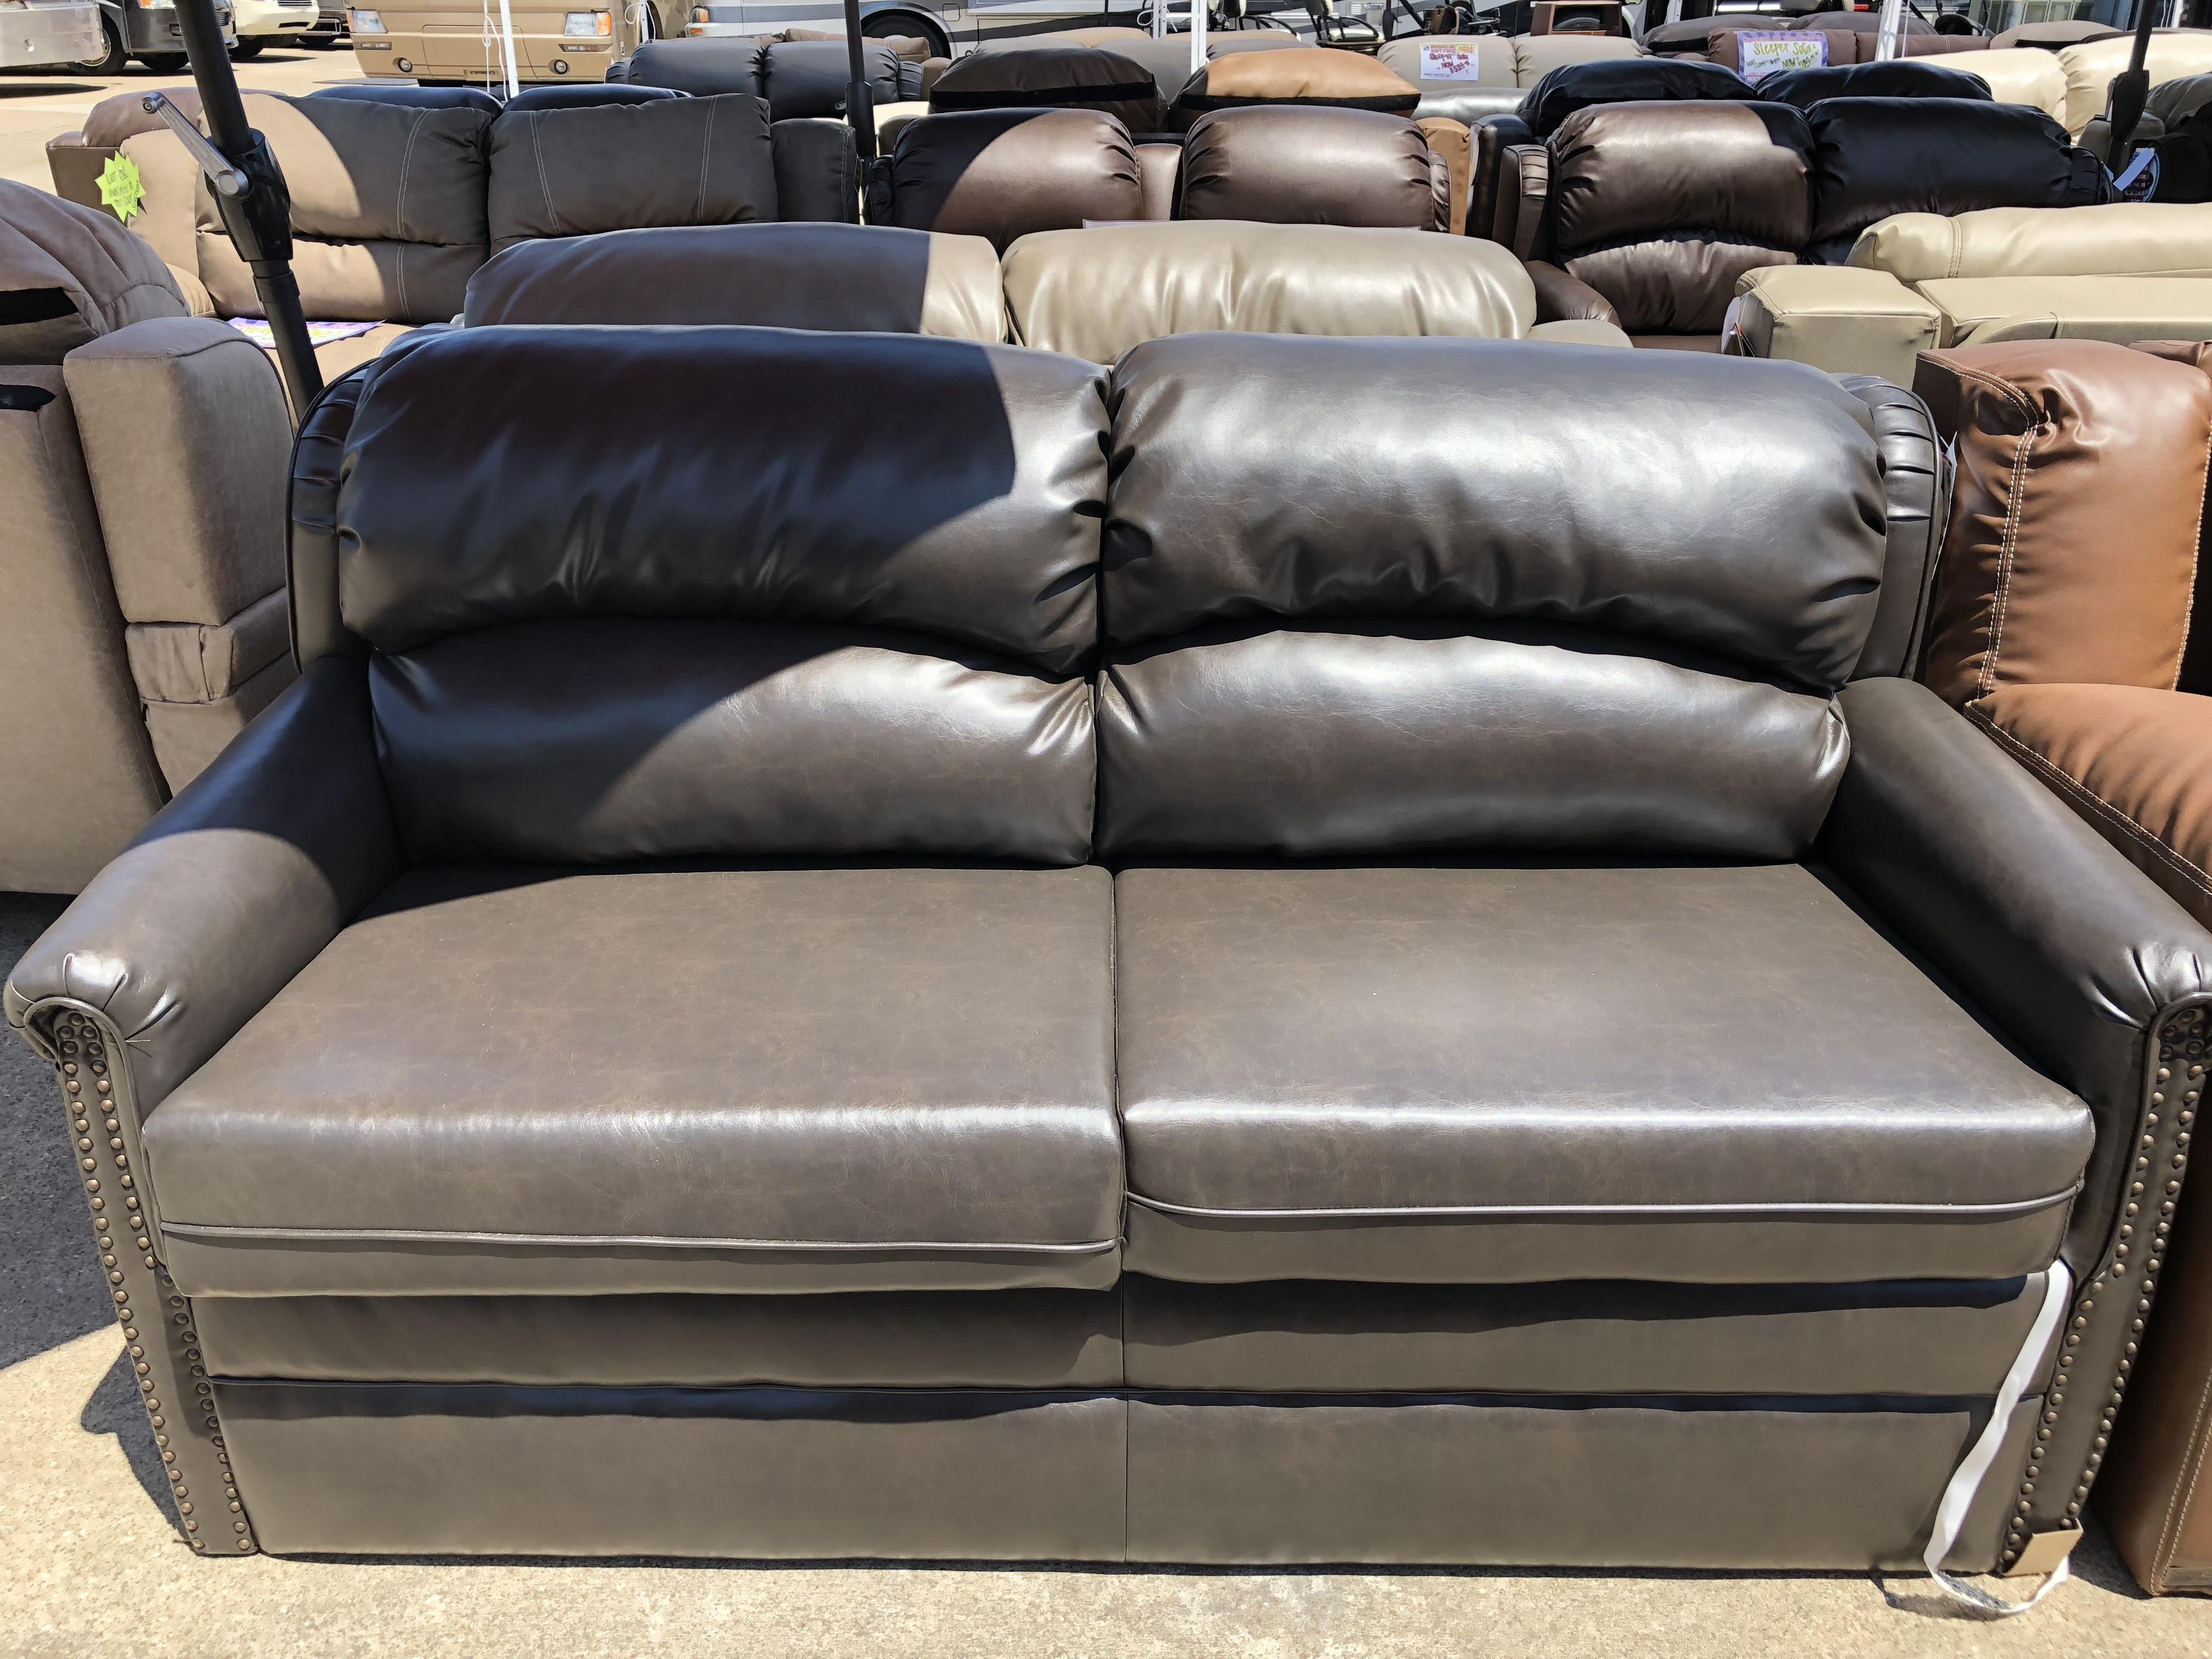 70 Bifold Sleeper Sofa Rv Furniture In Coleman Seal Pr101 34 Cs